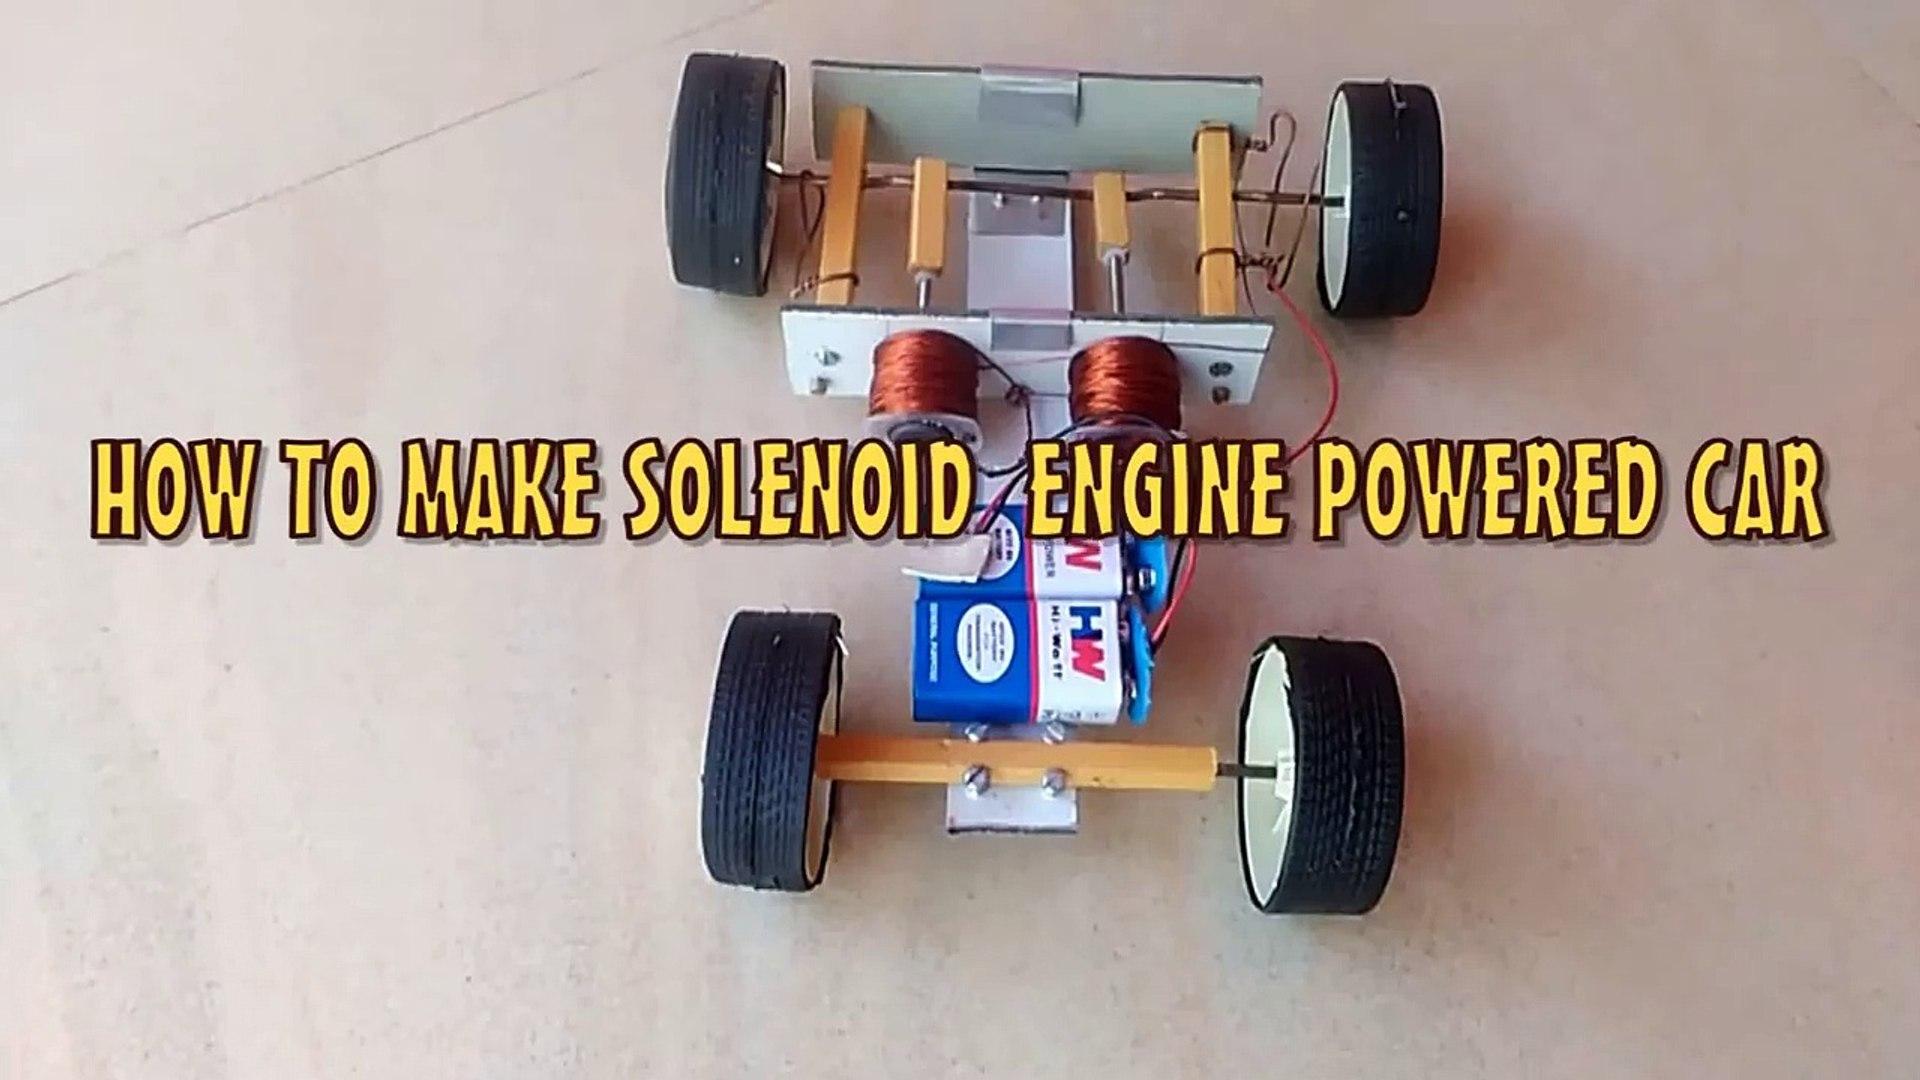 Solenoid Engine Car | Diy Tutorial | ONE MILLION VIEWS!!!